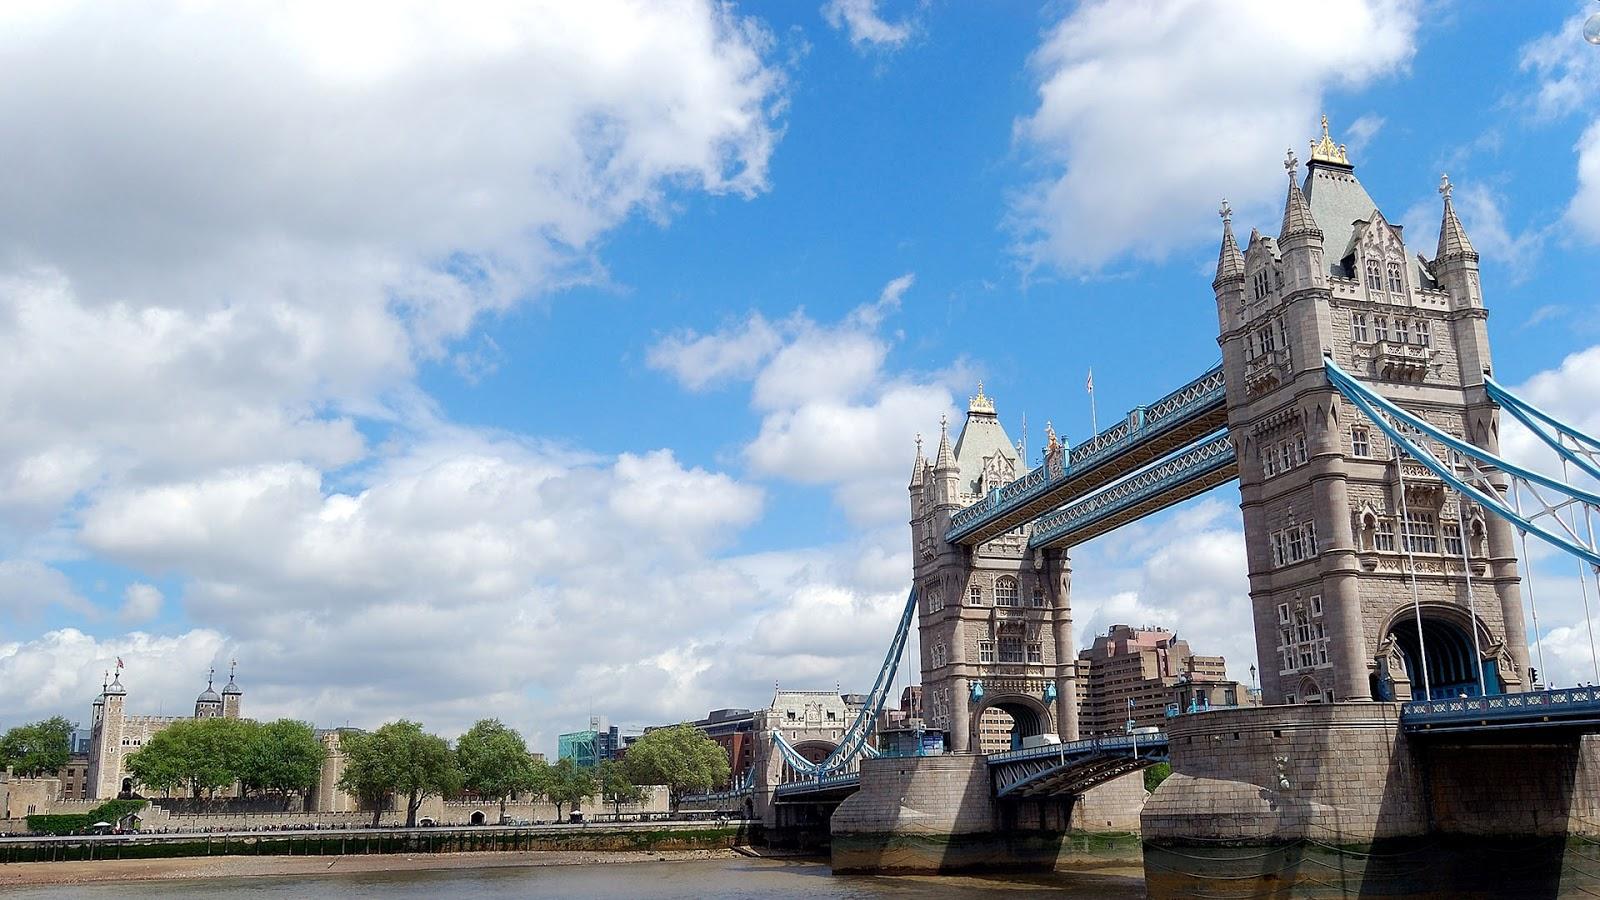 wallpaper bridge london scenic - photo #37